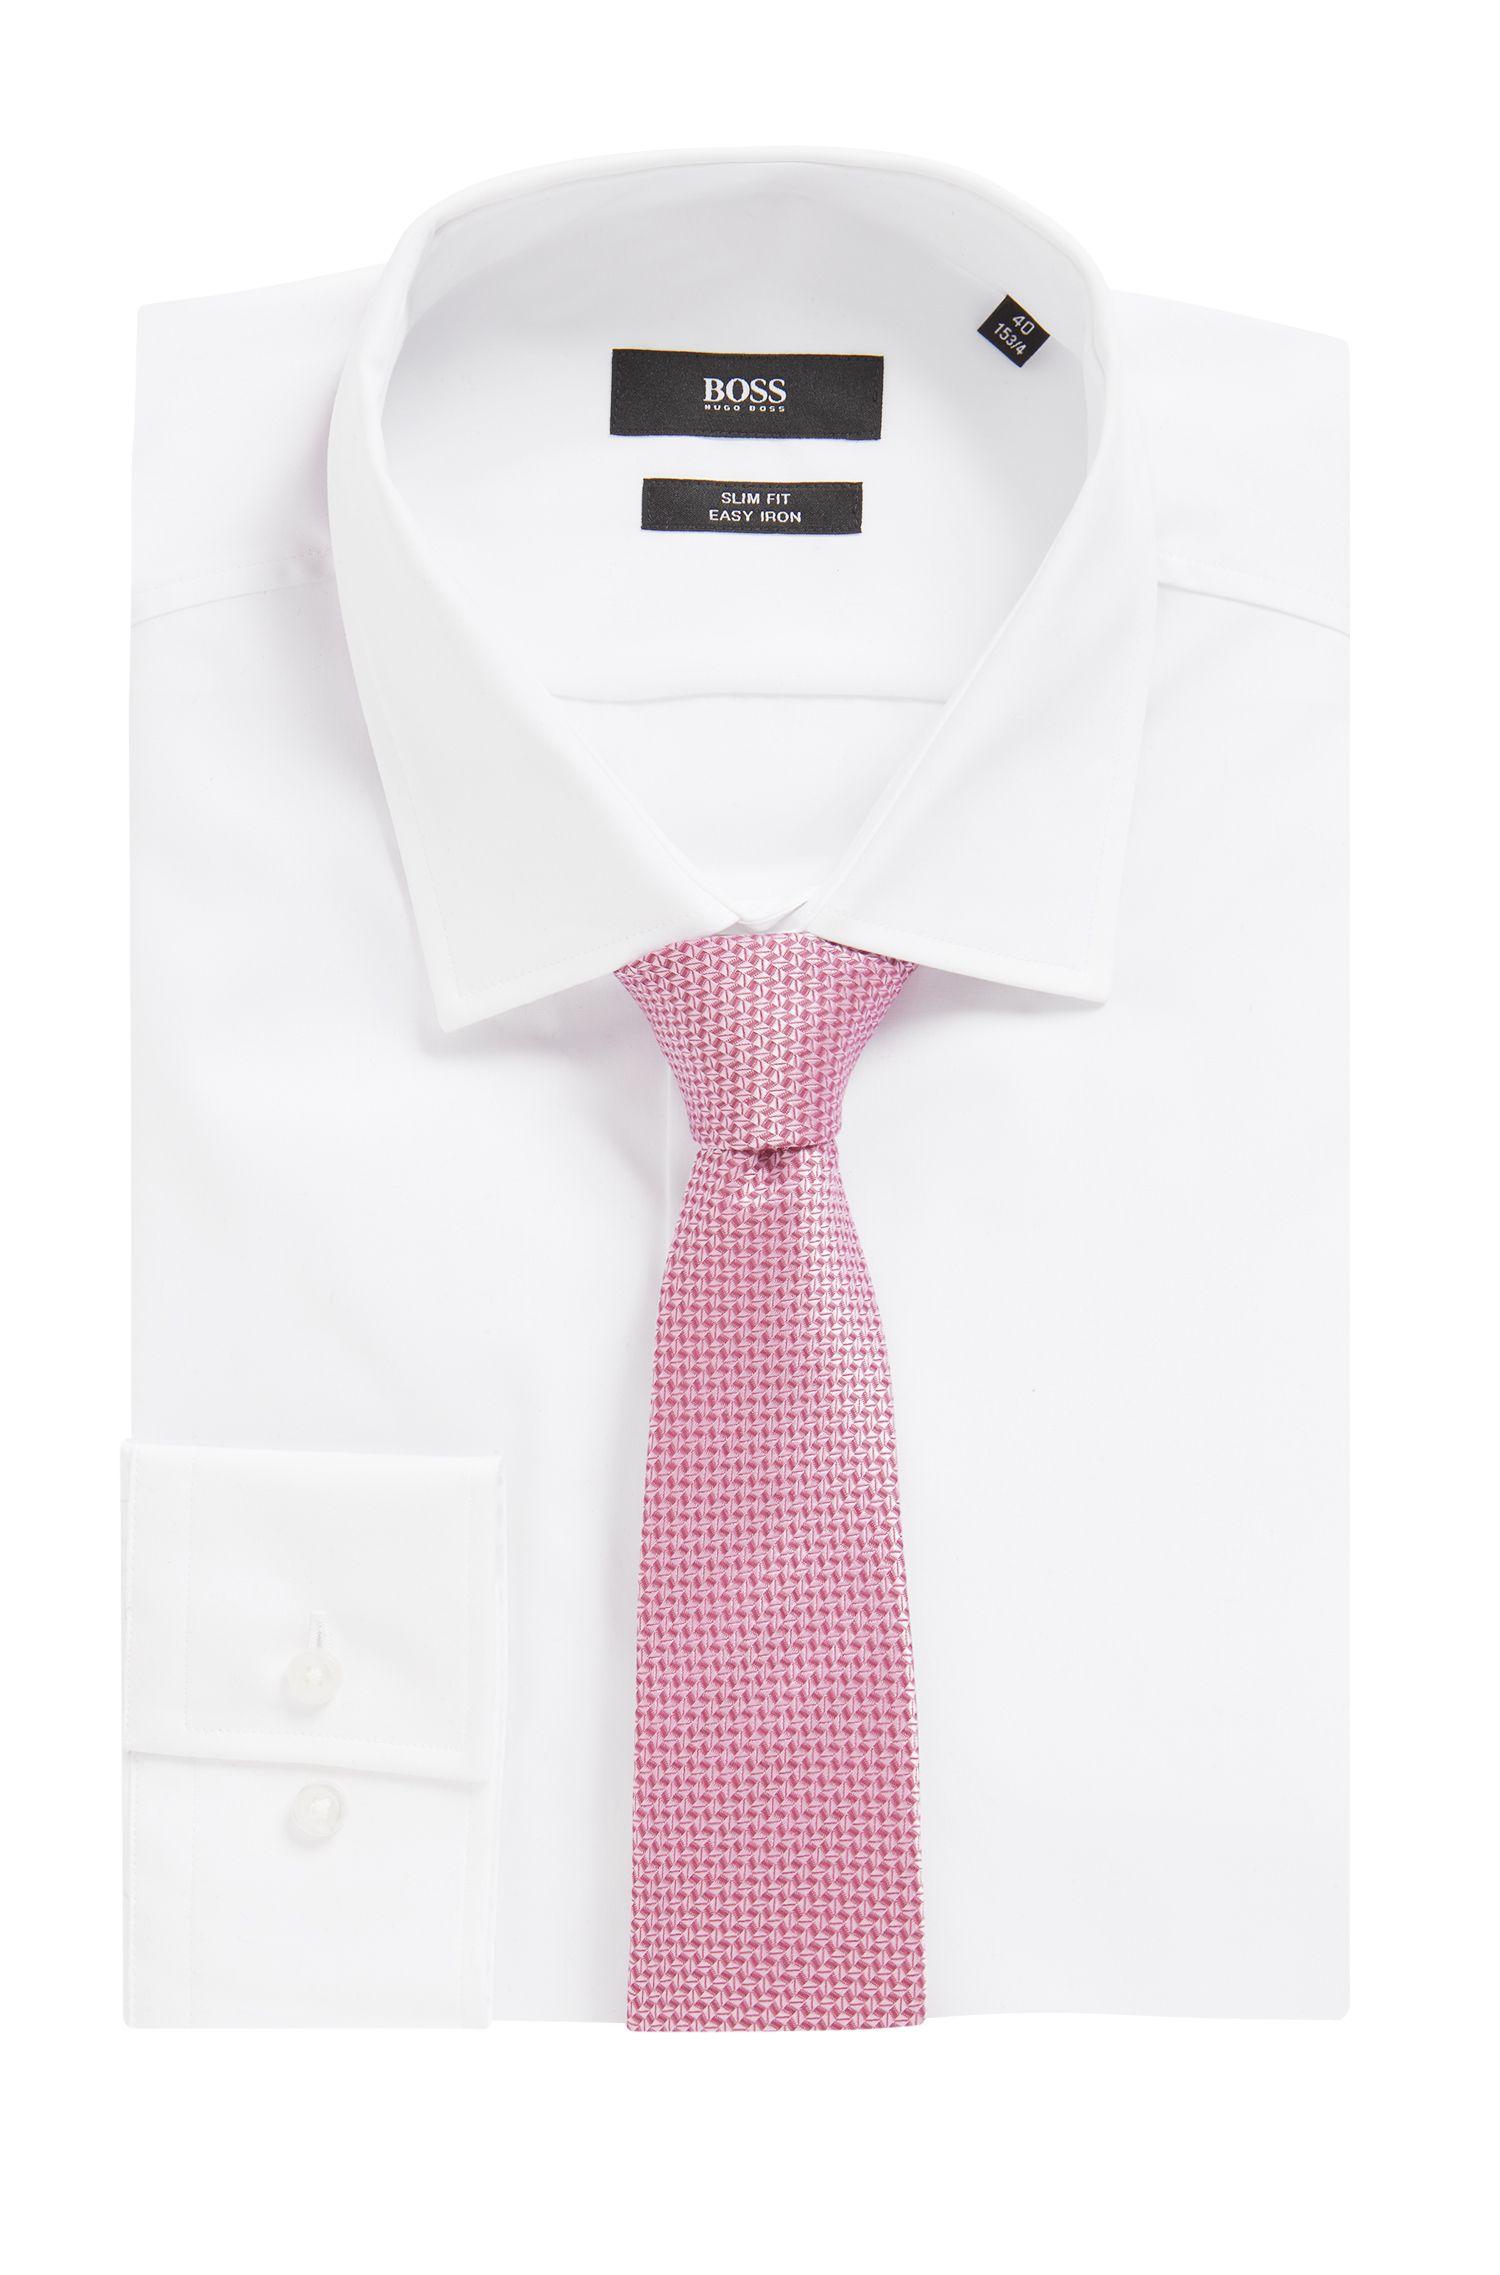 Micro-pattern tie in water-repellent silk, light pink